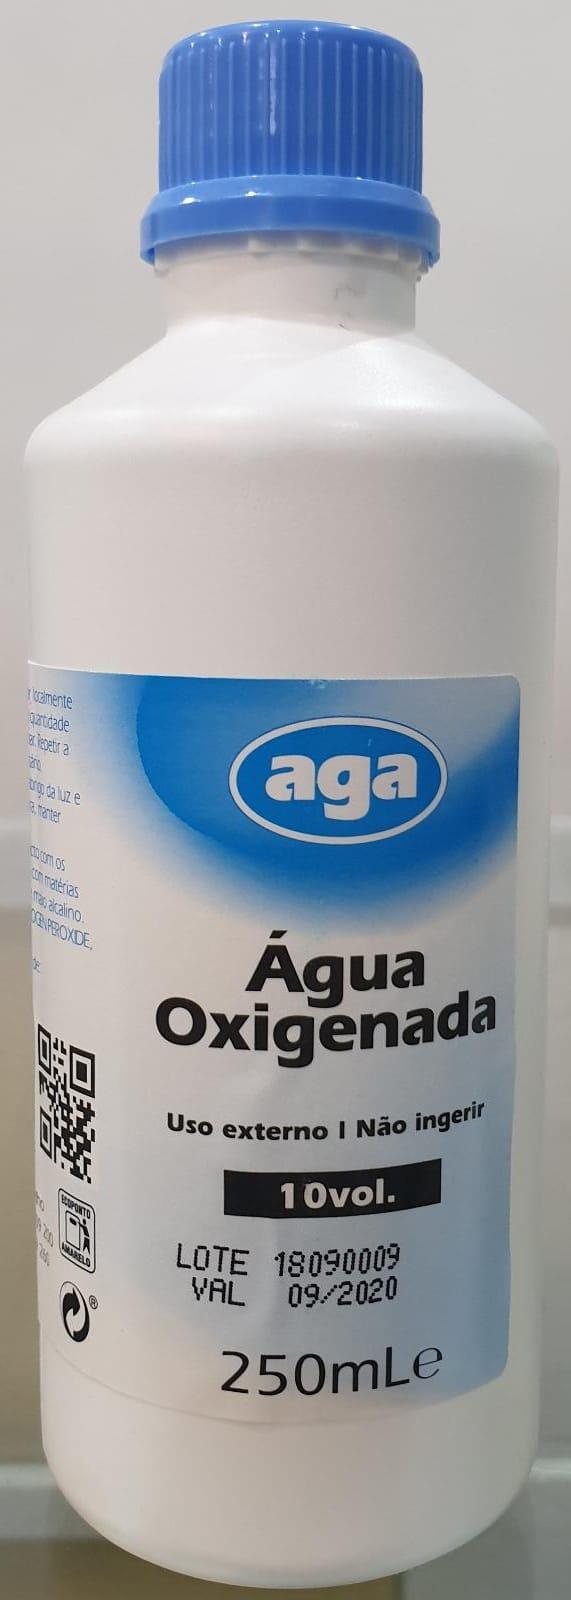 Água Oxigenada 10 Vol